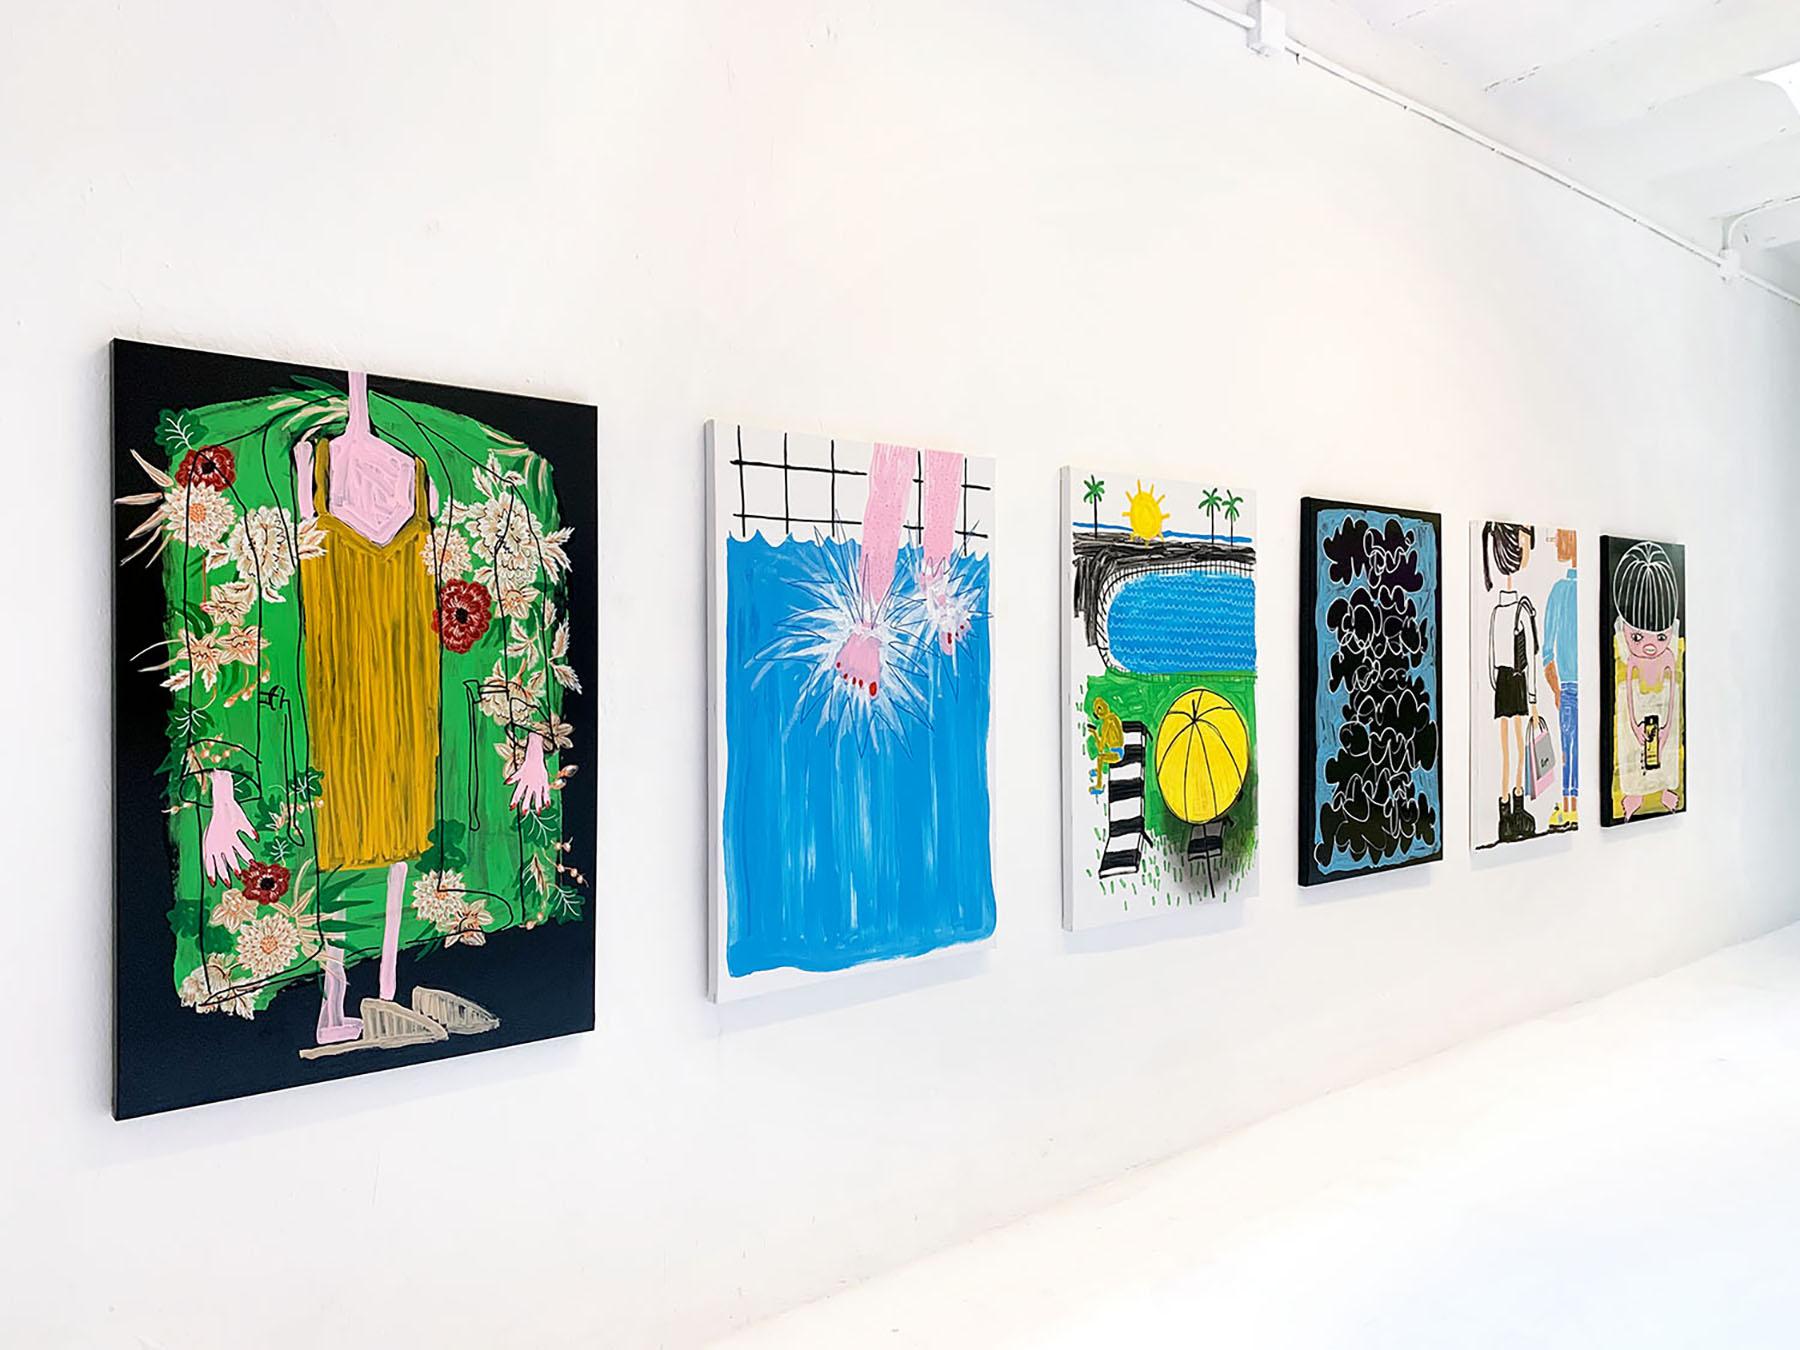 online exhibition, on view, painting, original work on paper, canvas, unique